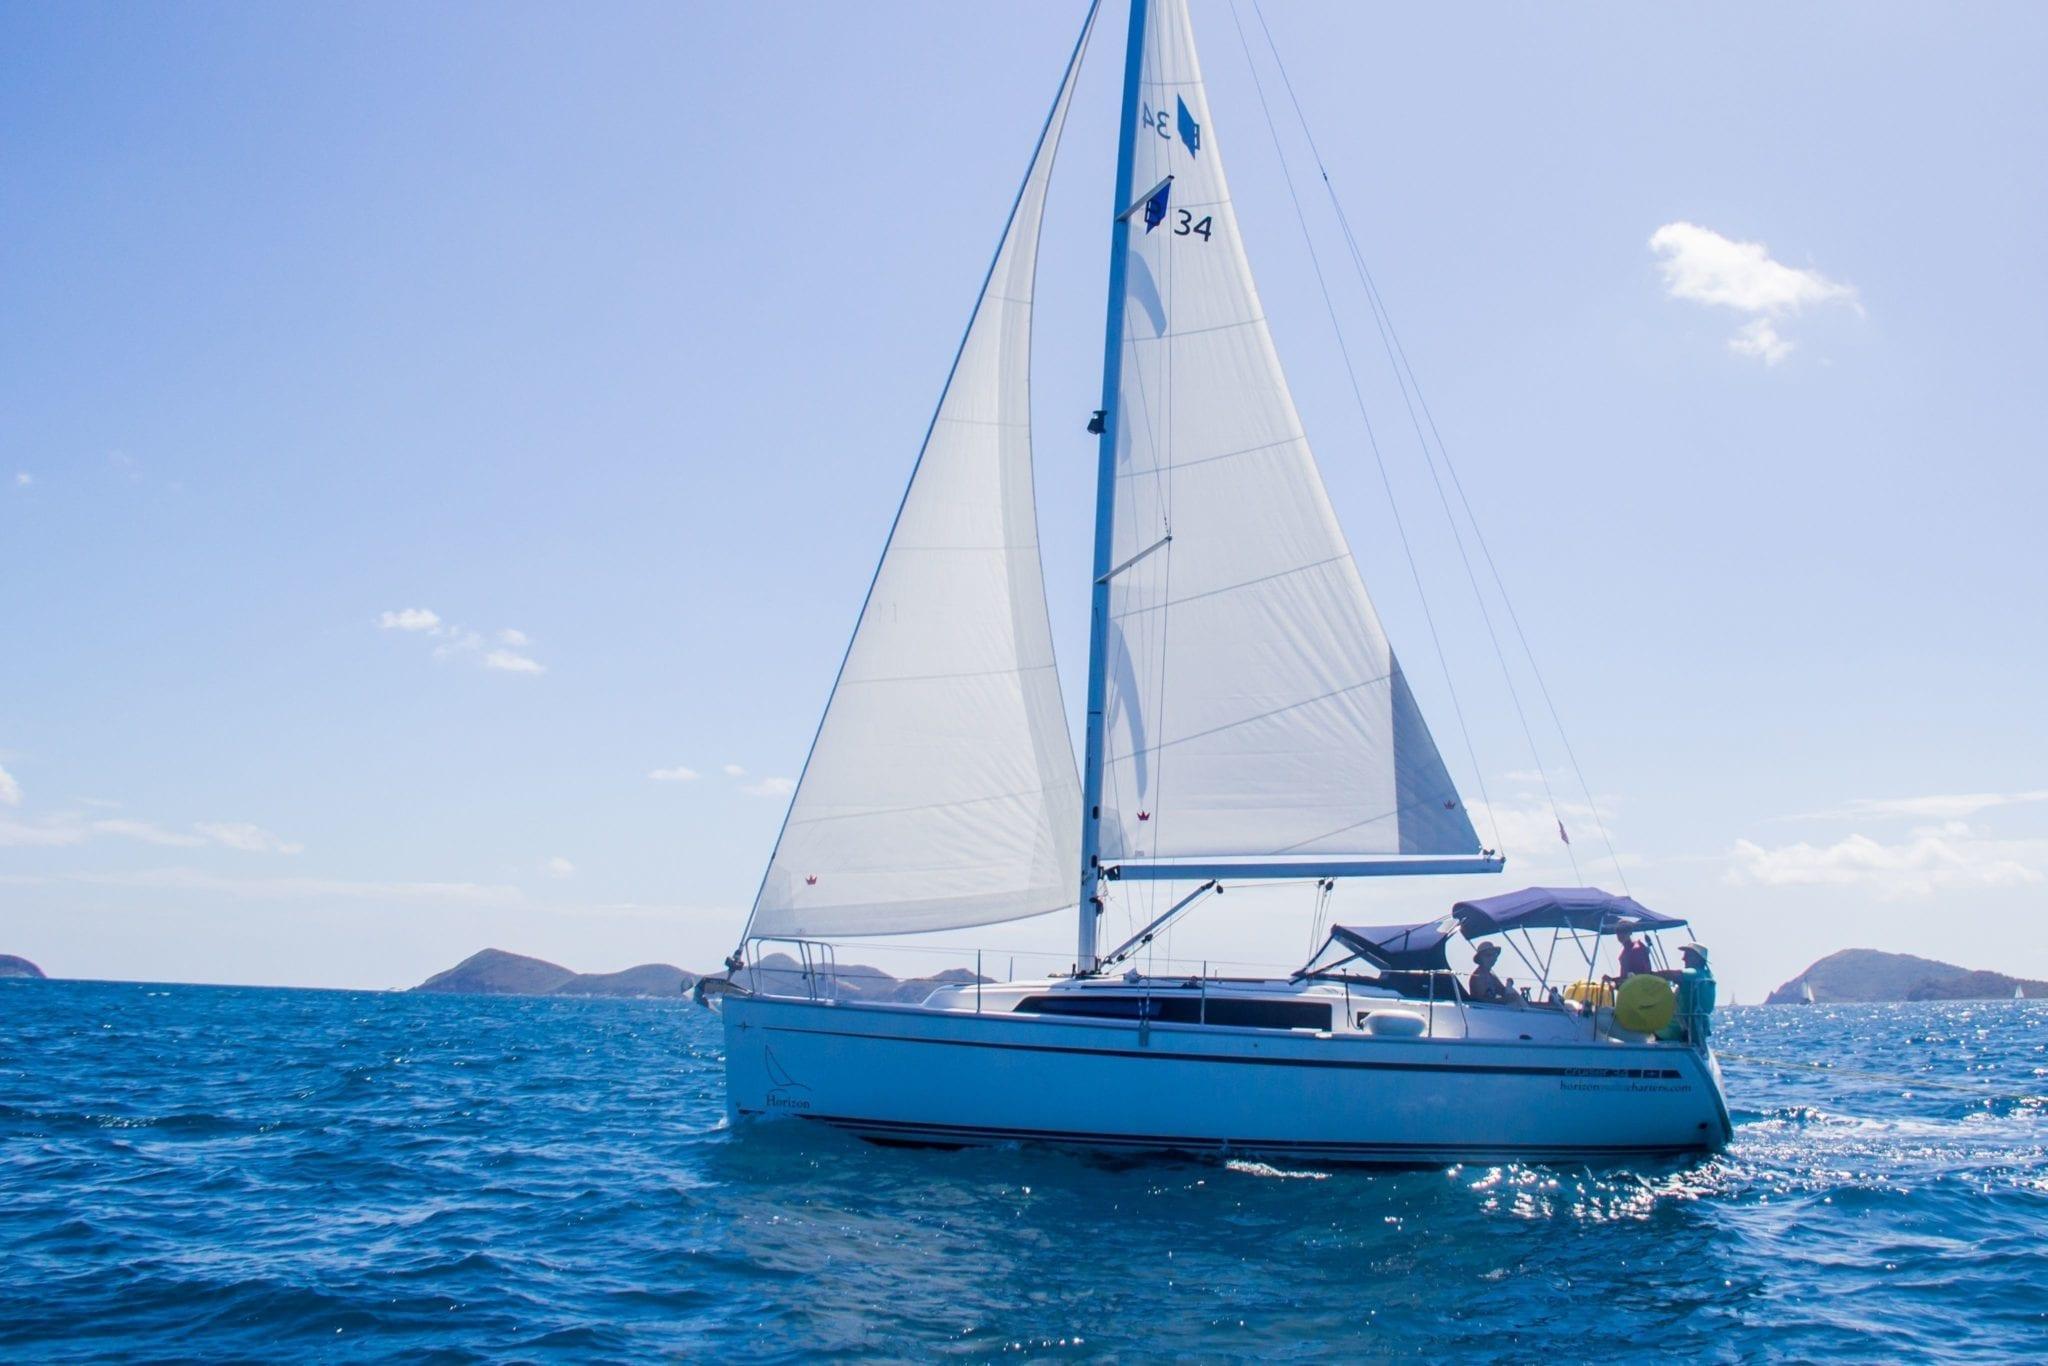 Bavaria 34 2017 Model Charter Yacht BVI